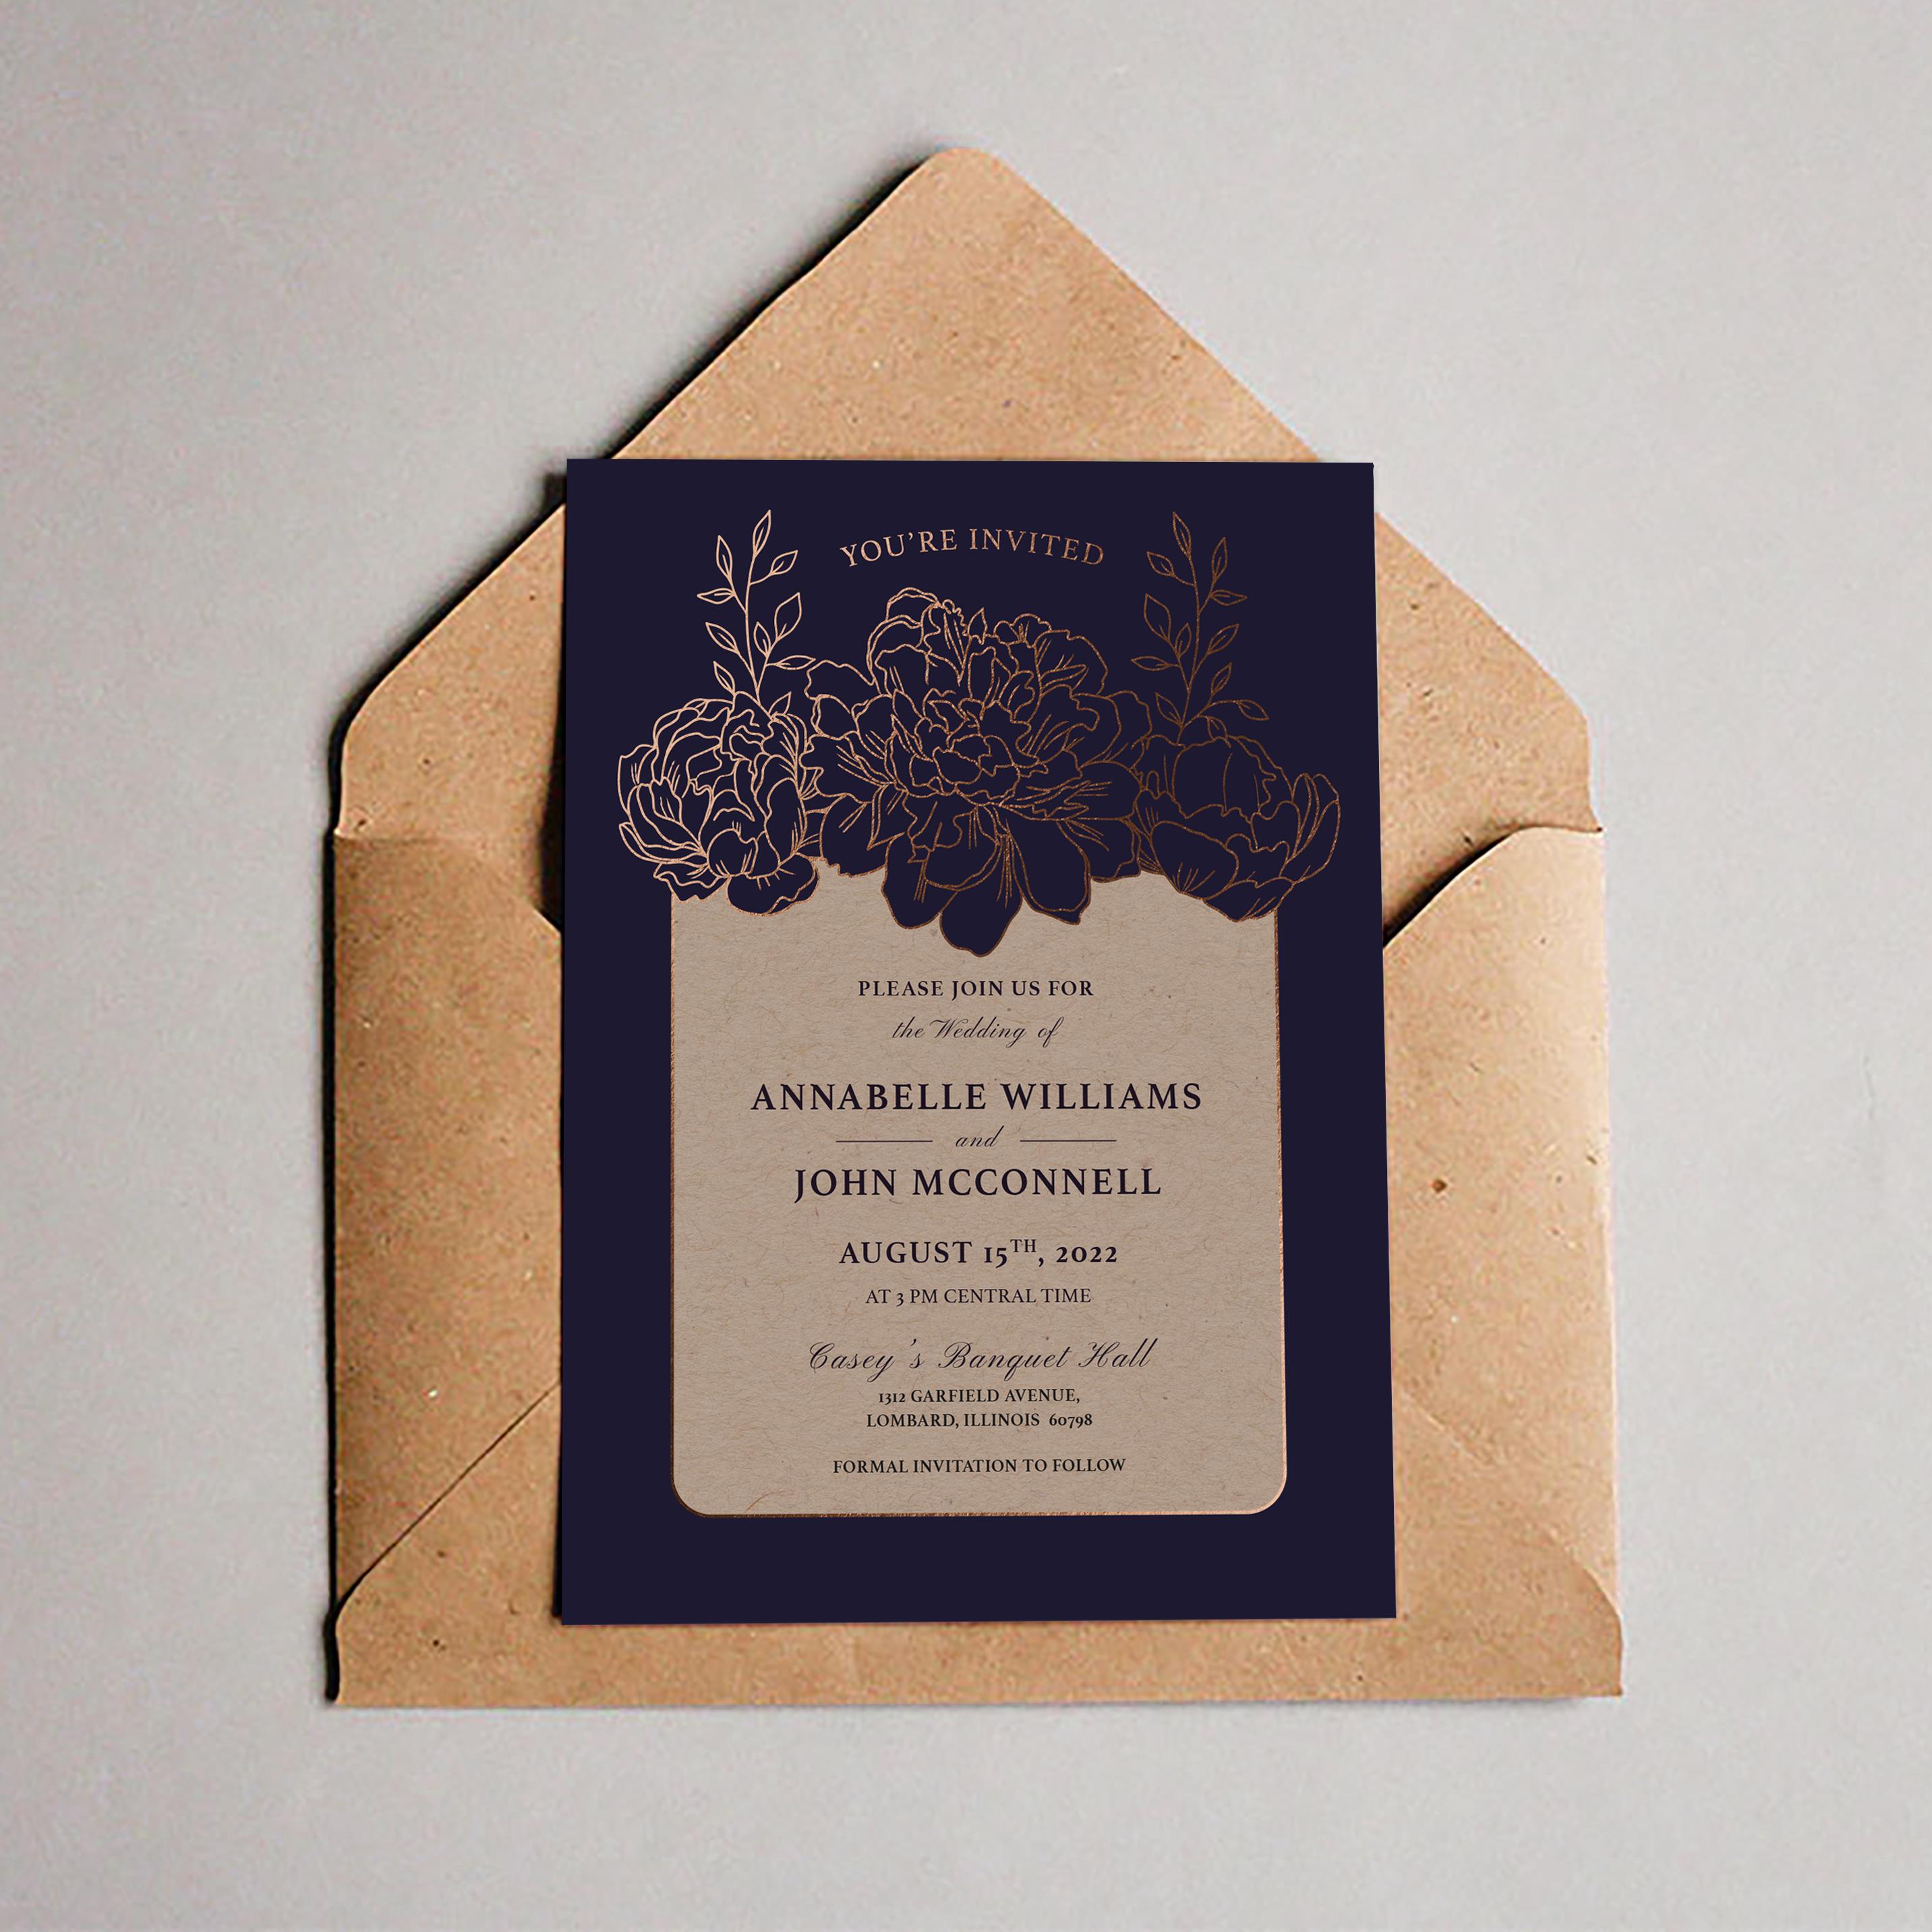 Invitation Designs | Buy Invitation Or Card Design Online